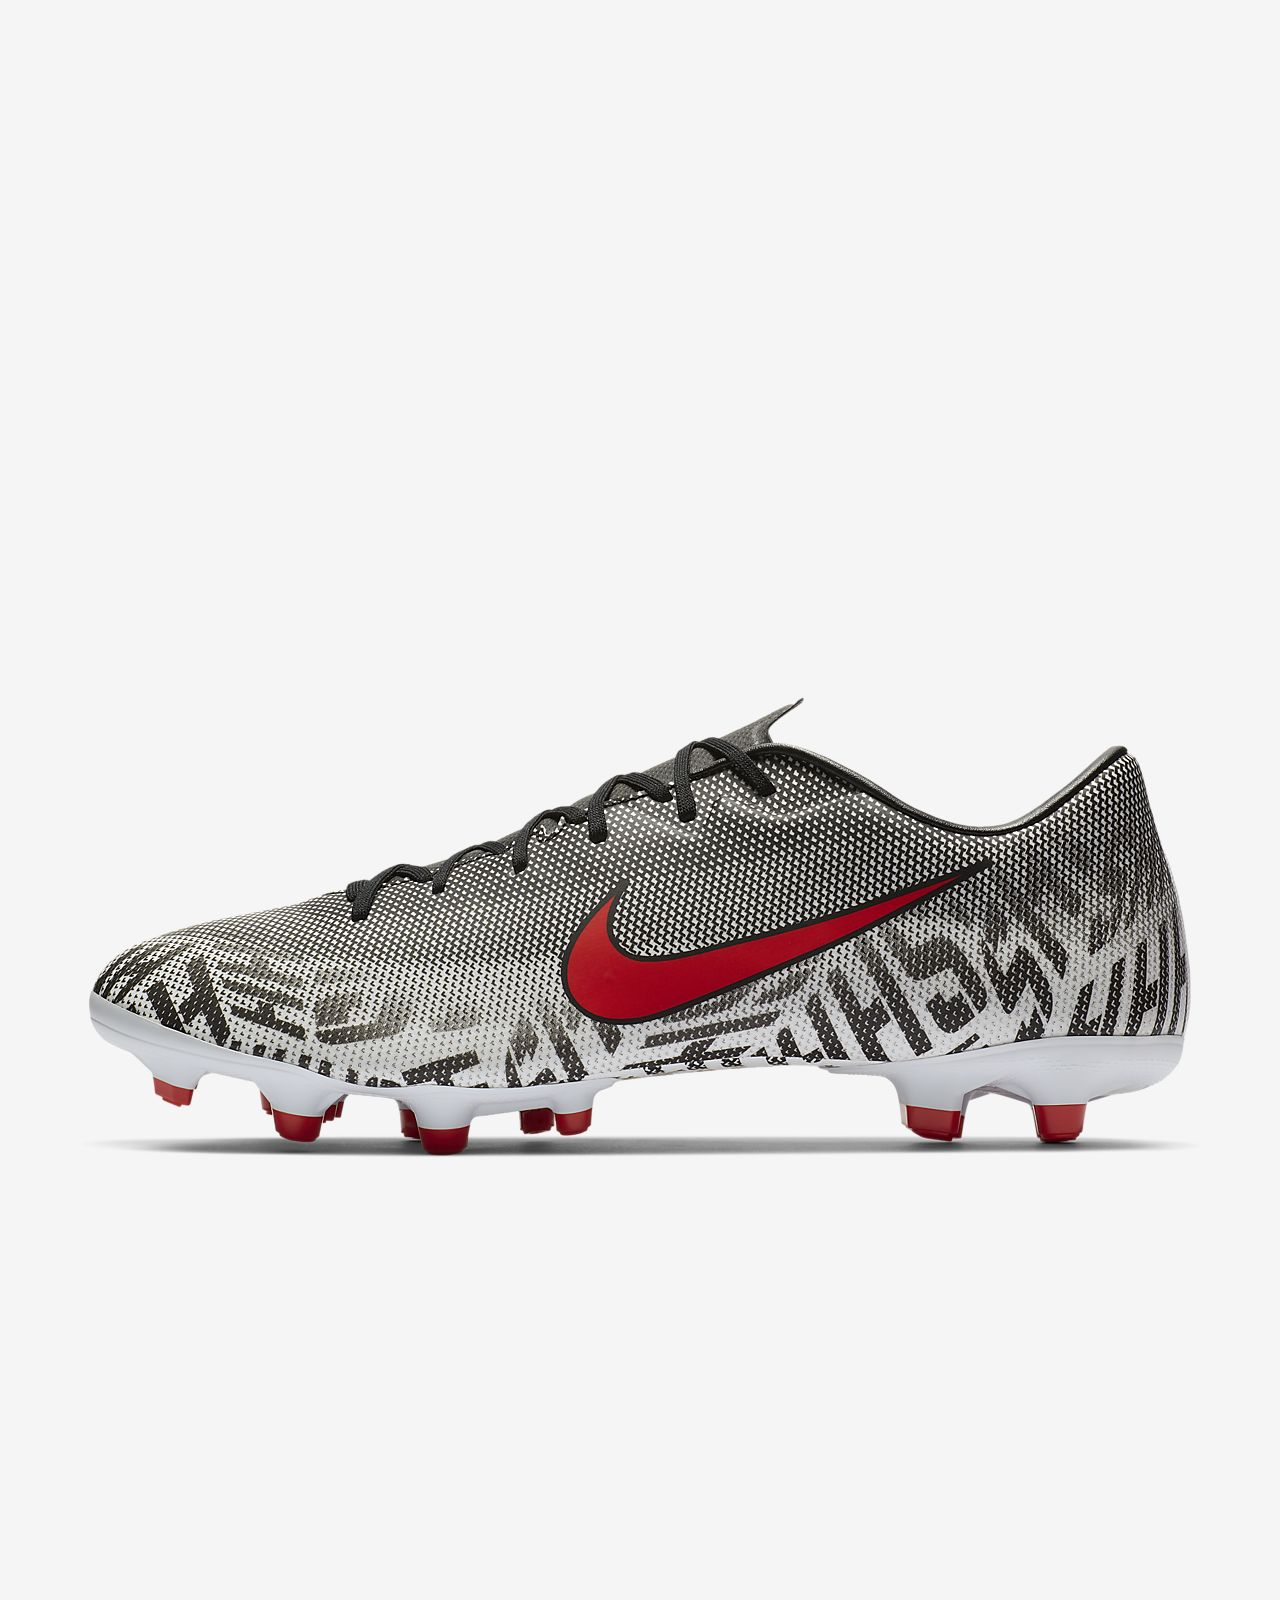 size 40 bad2d 88bd1 ... Scarpa da calcio con tacchetti multiterreno Nike Mercurial Vapor XII  Academy Neymar